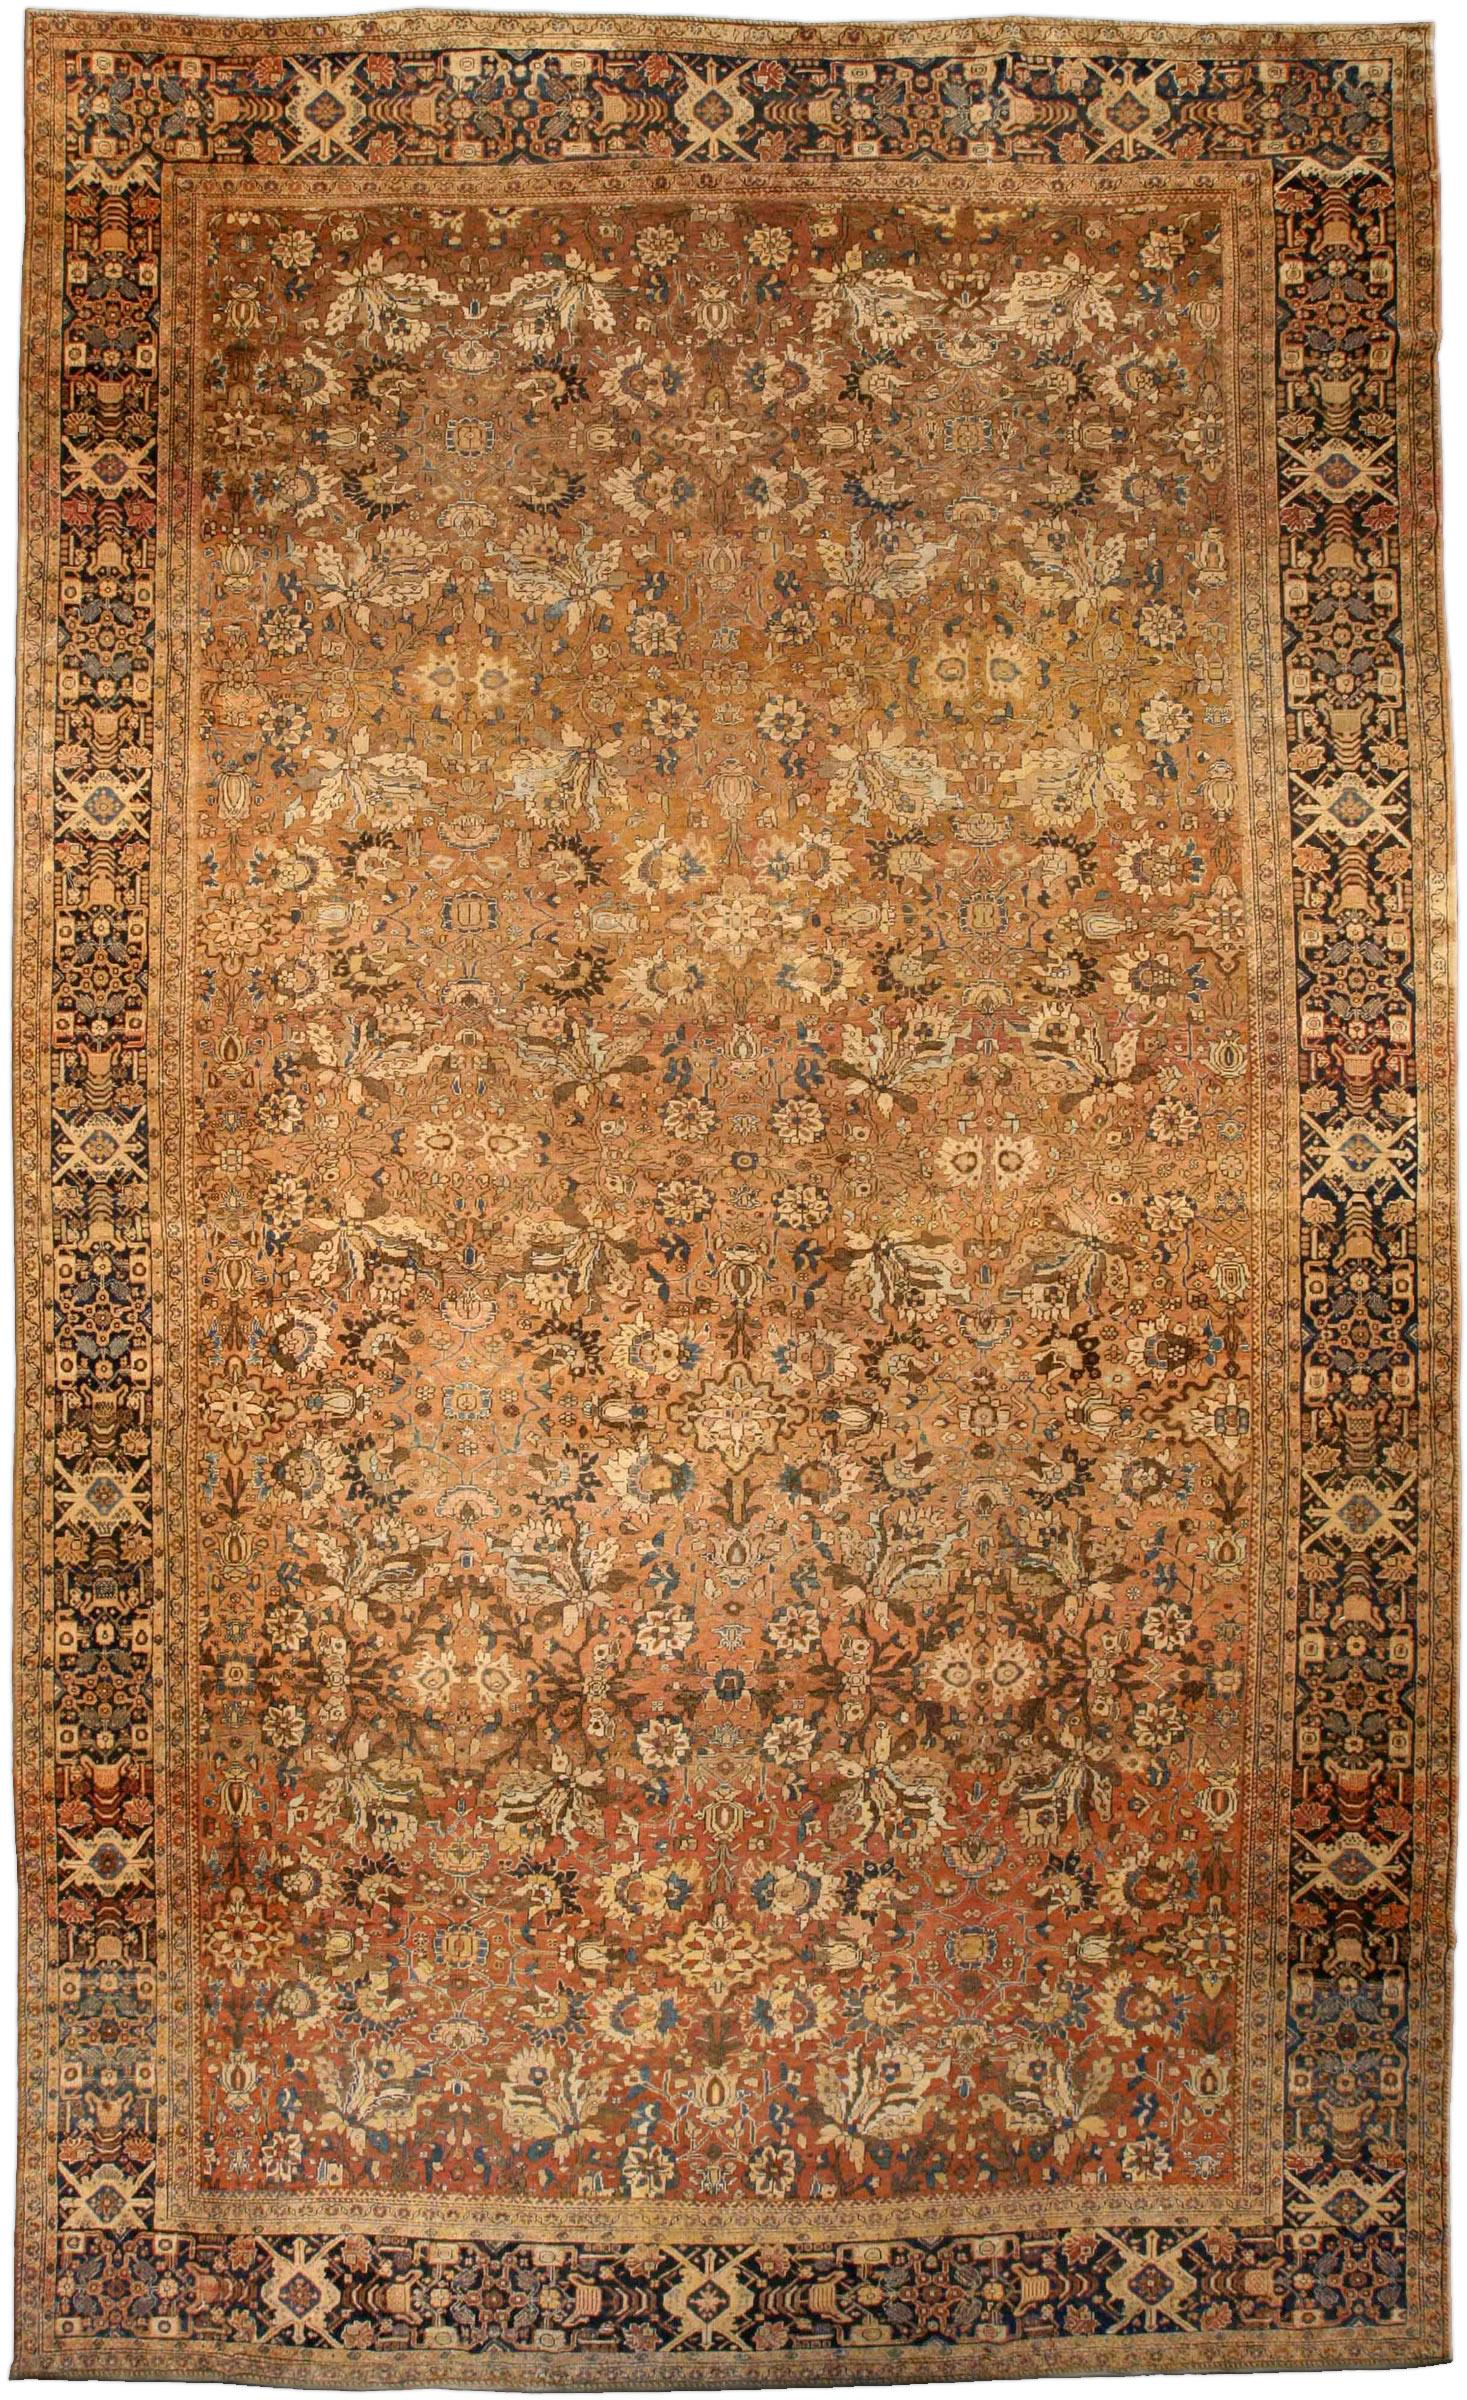 Antique Persian Sultanabad Carpet BB1393